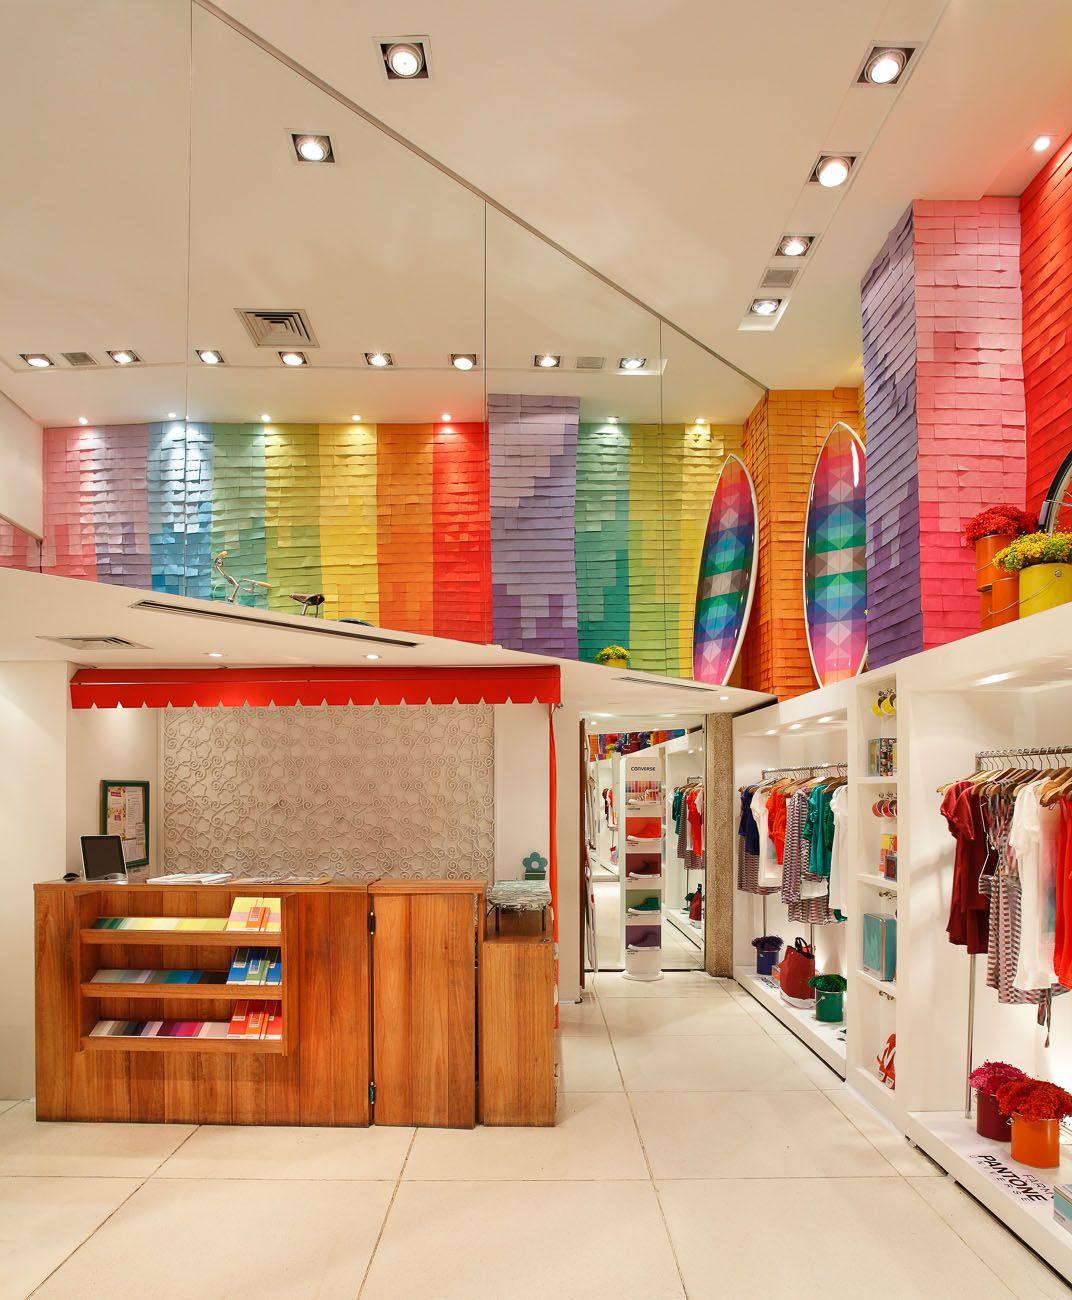 Wall Decor Shops: Colorful Walls #decor #colors #lojas